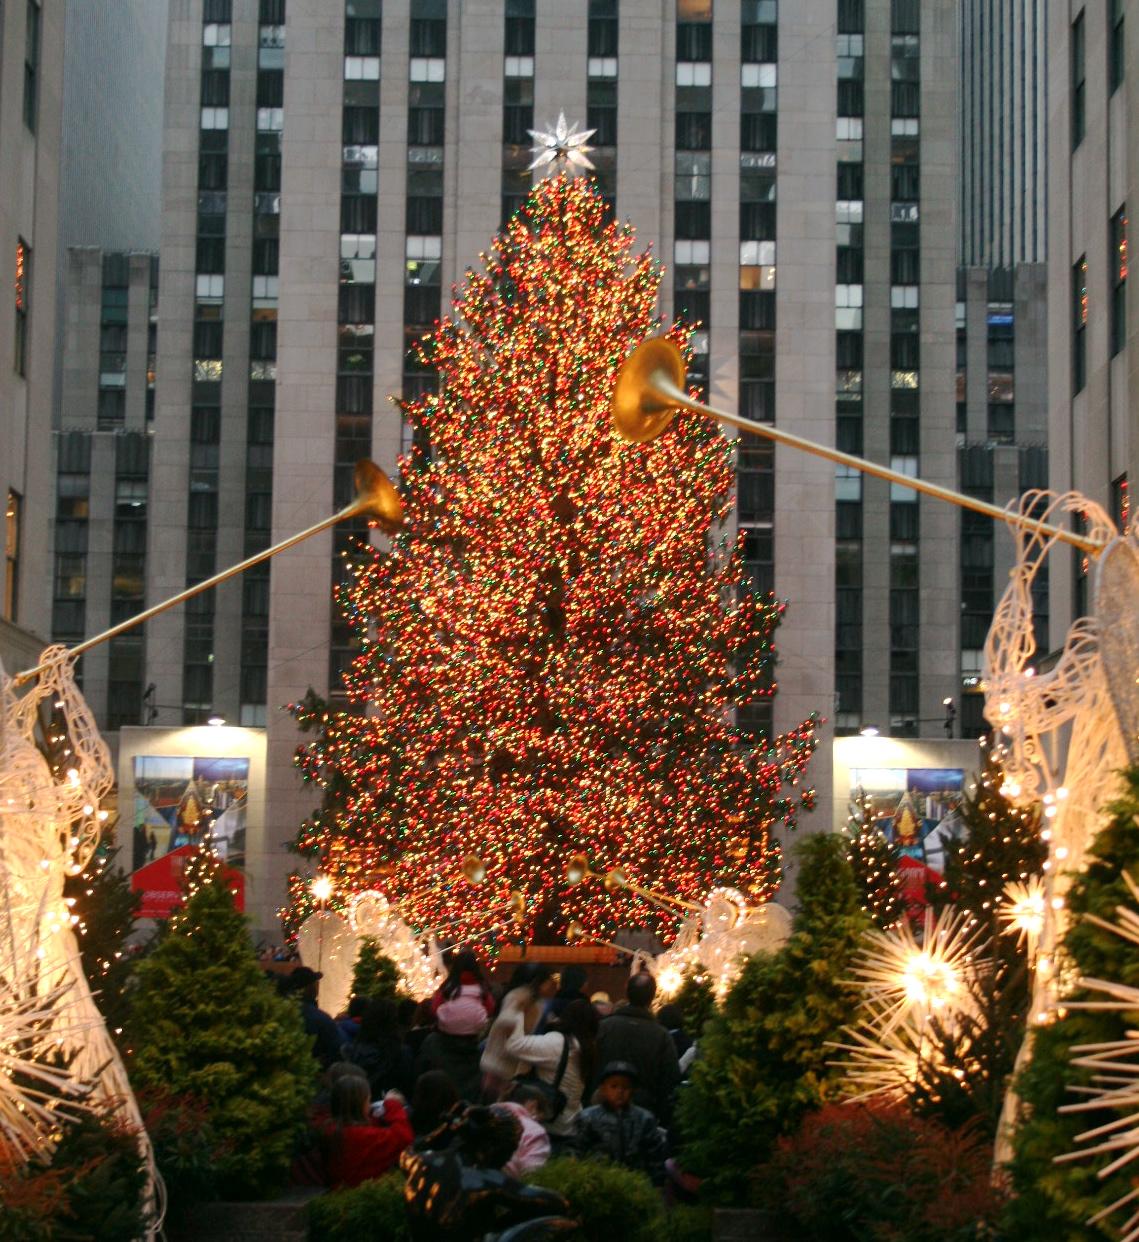 Christmas tree at Rockefeller Plaza, New York, 2006. Photographer: Alsandro